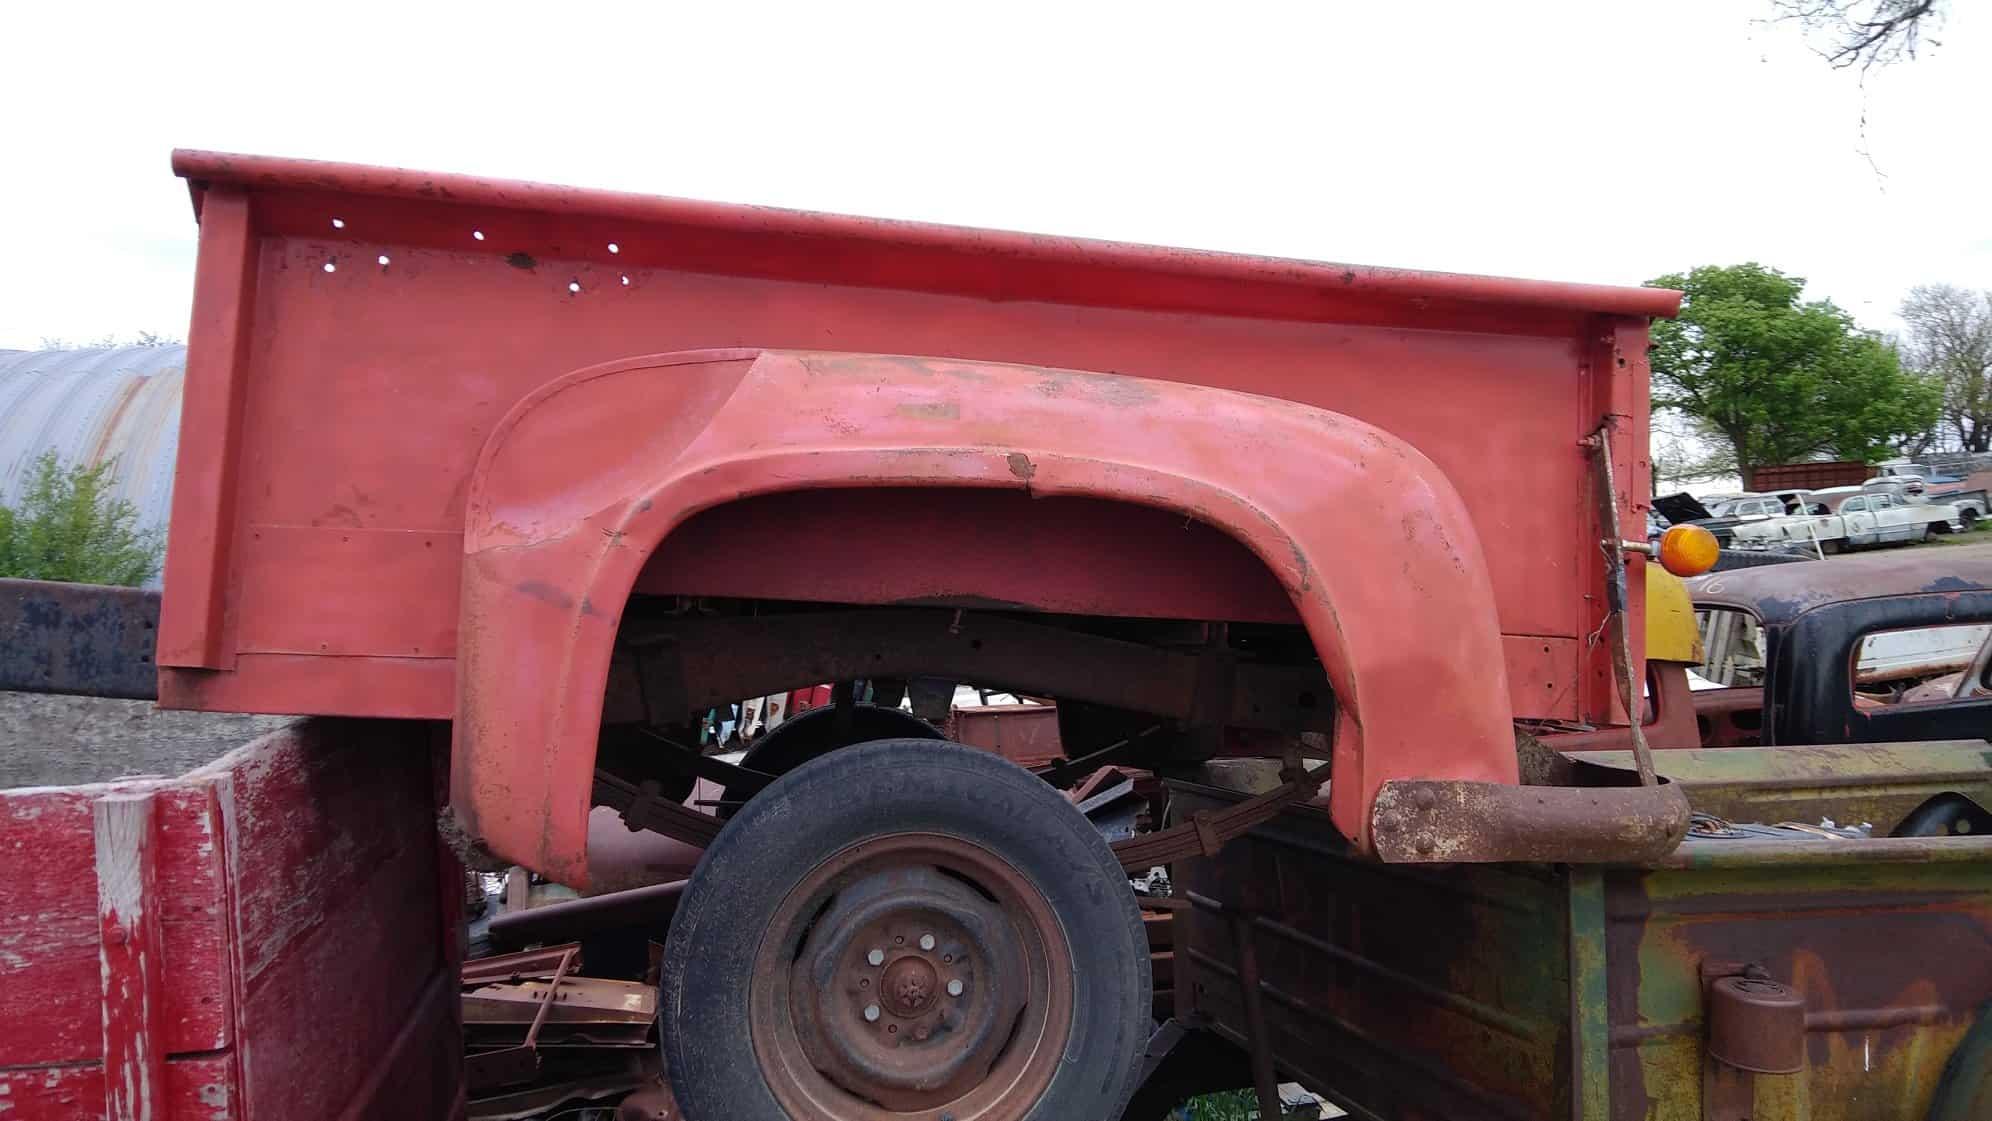 Classic Truck Beds For Sale in Harvard, Nebraska -02